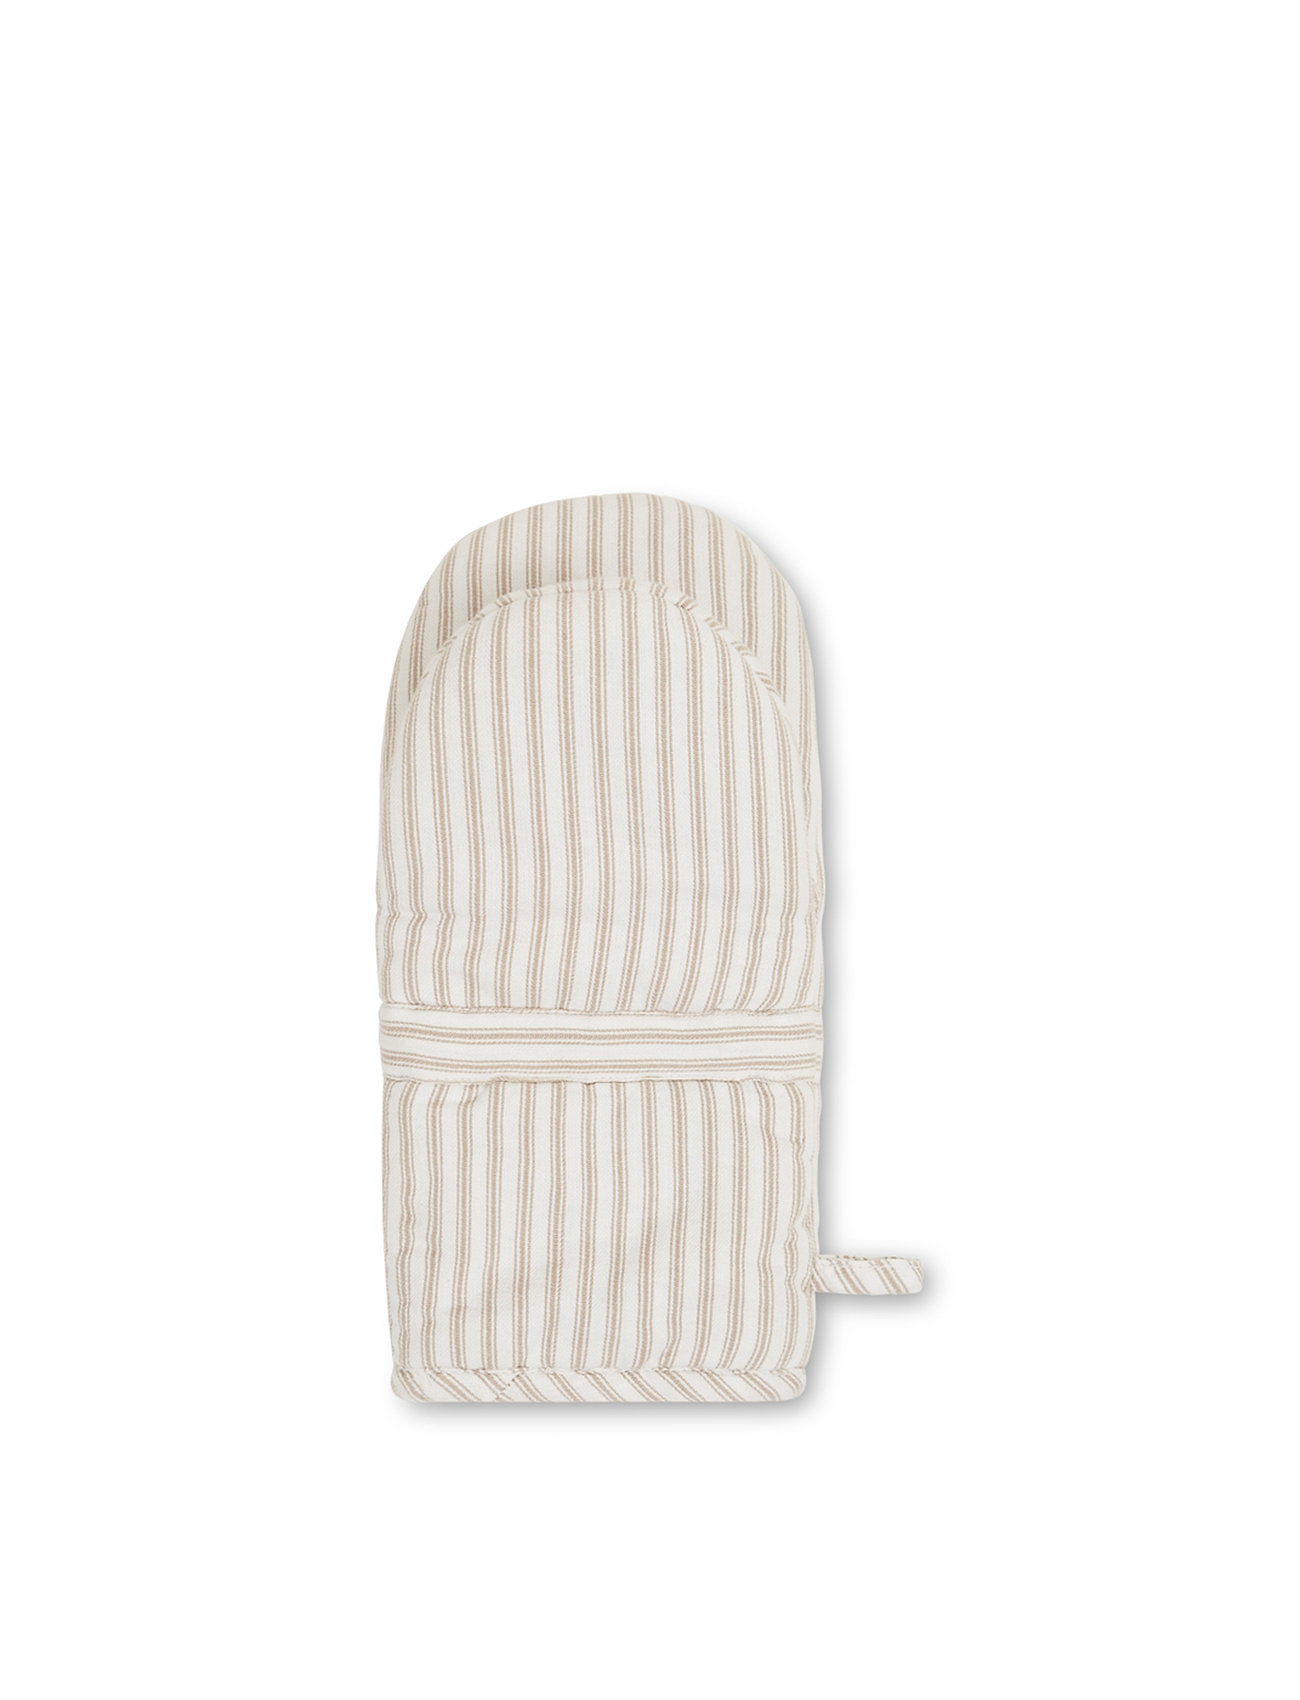 Lexington Home - Icons Cotton Herringbone Striped Mitten - pannulaput ja patakintaat - beige/white - 1